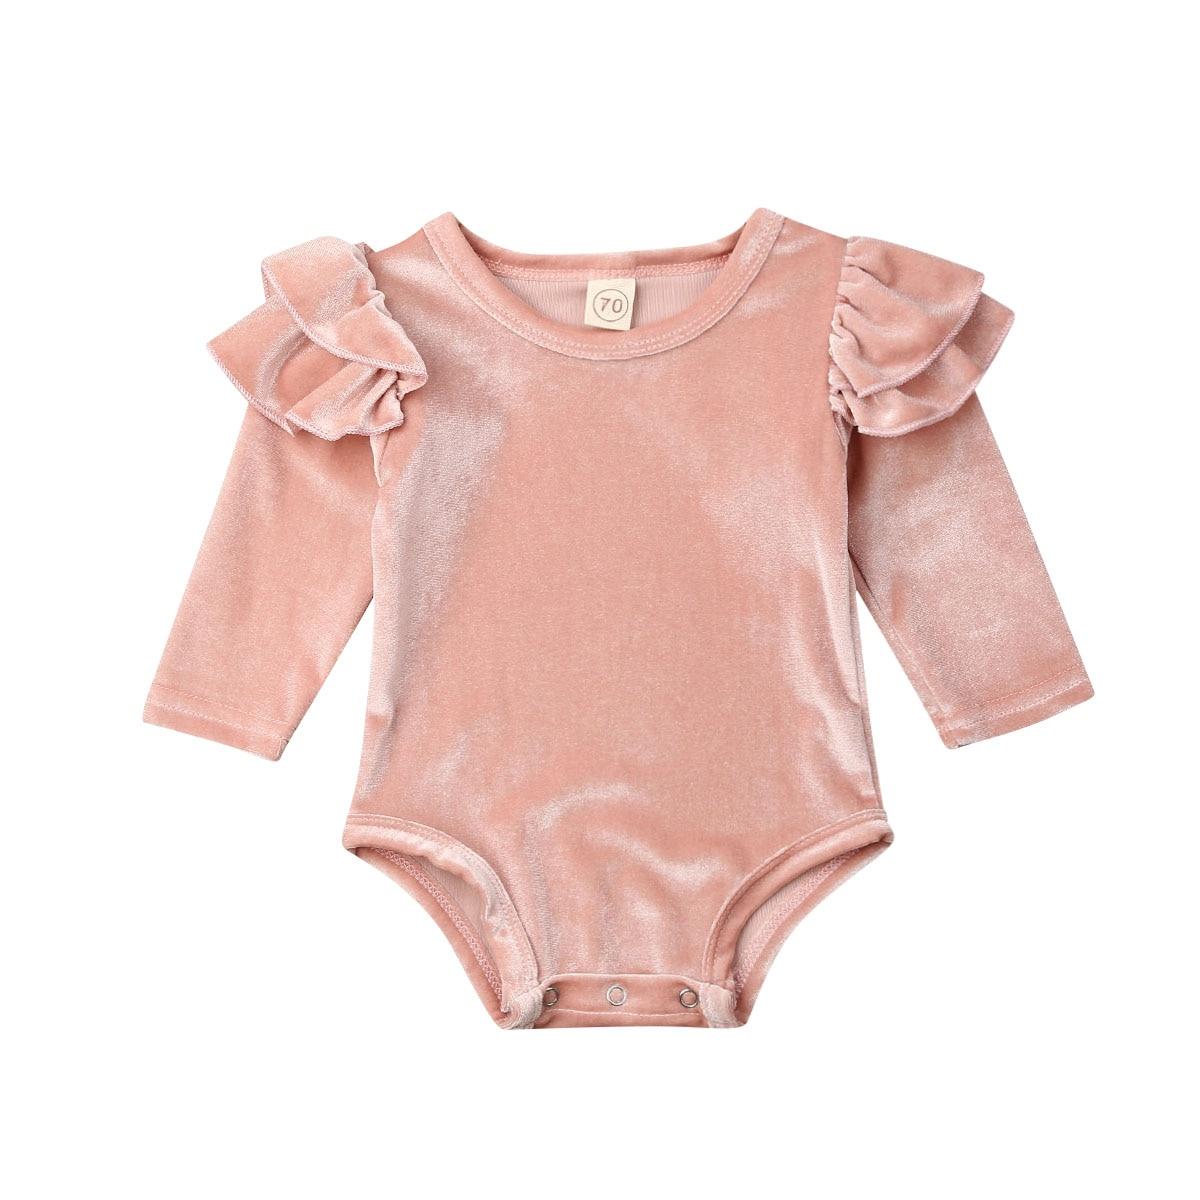 0-18M Newborn Infant Baby Girls Velvet Romper Long Sleeve Ruffles Jumpsuit Princess Baby Girl Autumn Spring Clothes Solid